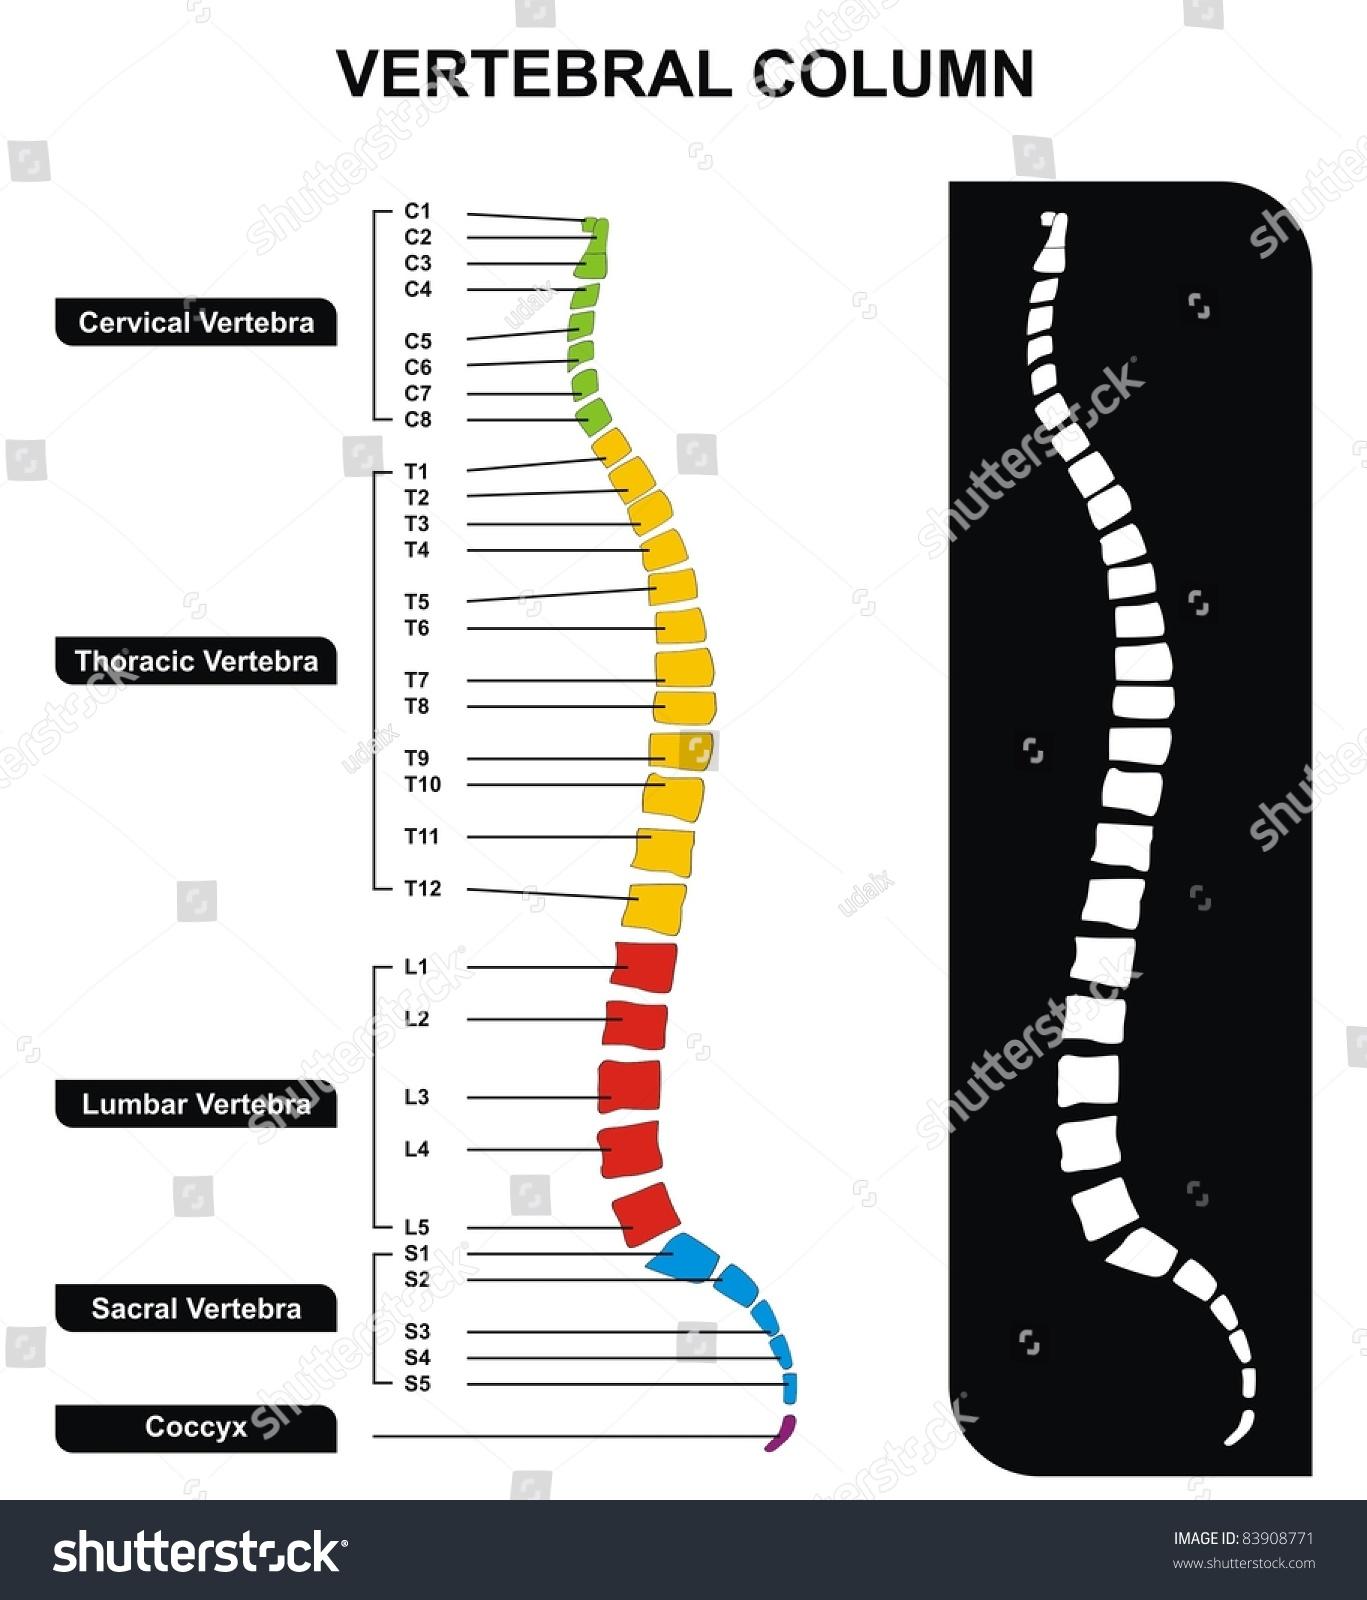 human spine diagram bones vertebrae peavey t 60 wiring vertebral column including vertebra groups